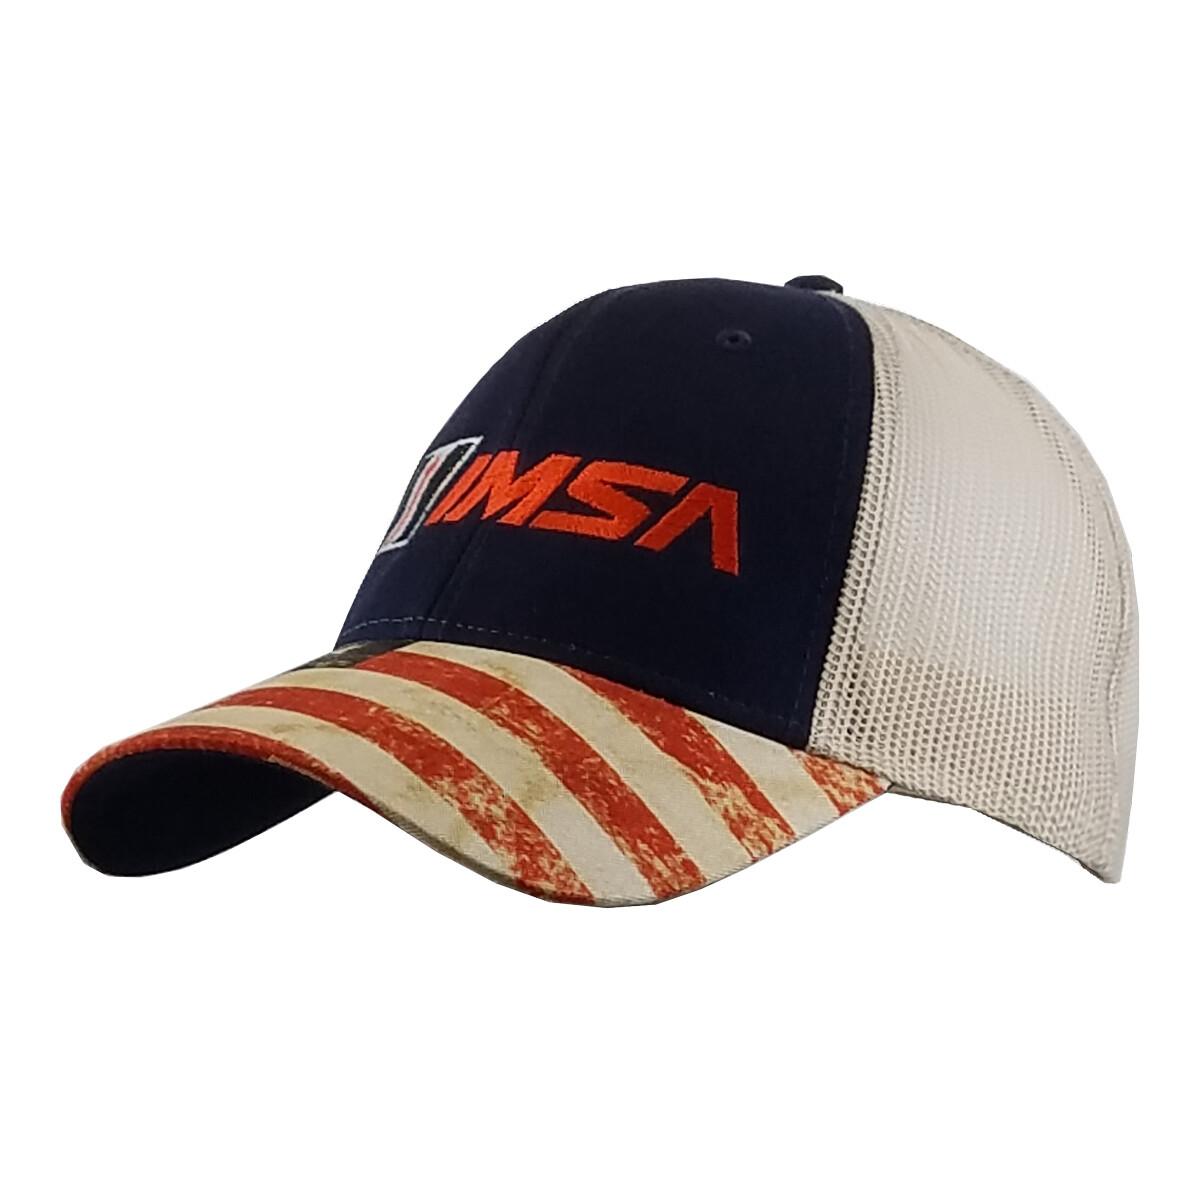 IMSA Trucker Mesh Hat with Flag Visor  - Navy/Stone